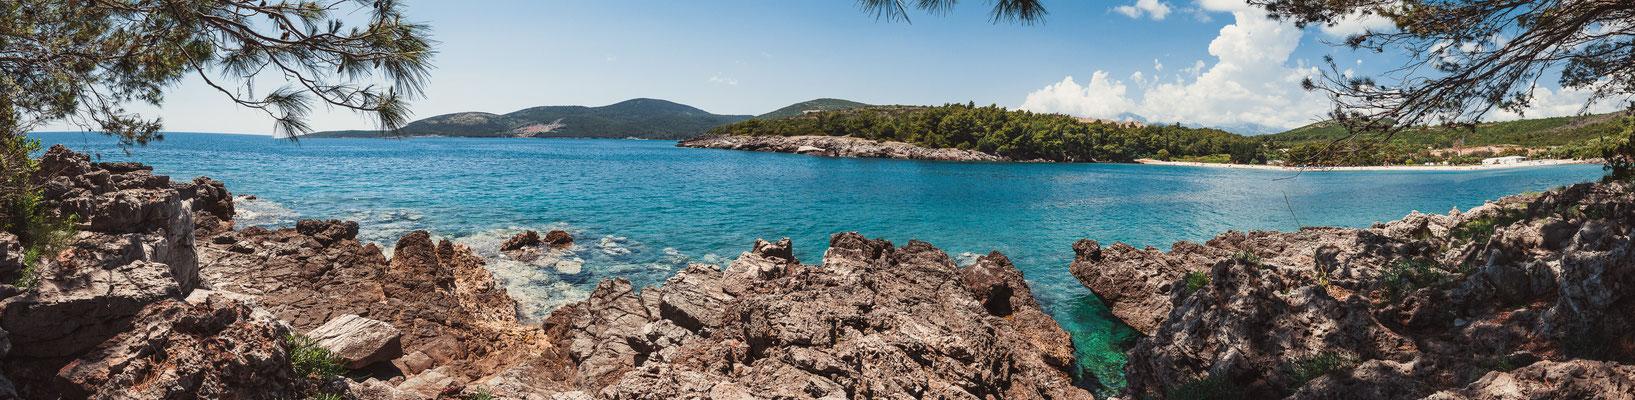 Beach Pržno - Plavi Horizont - Sauberes Meer und traumhafte Natur